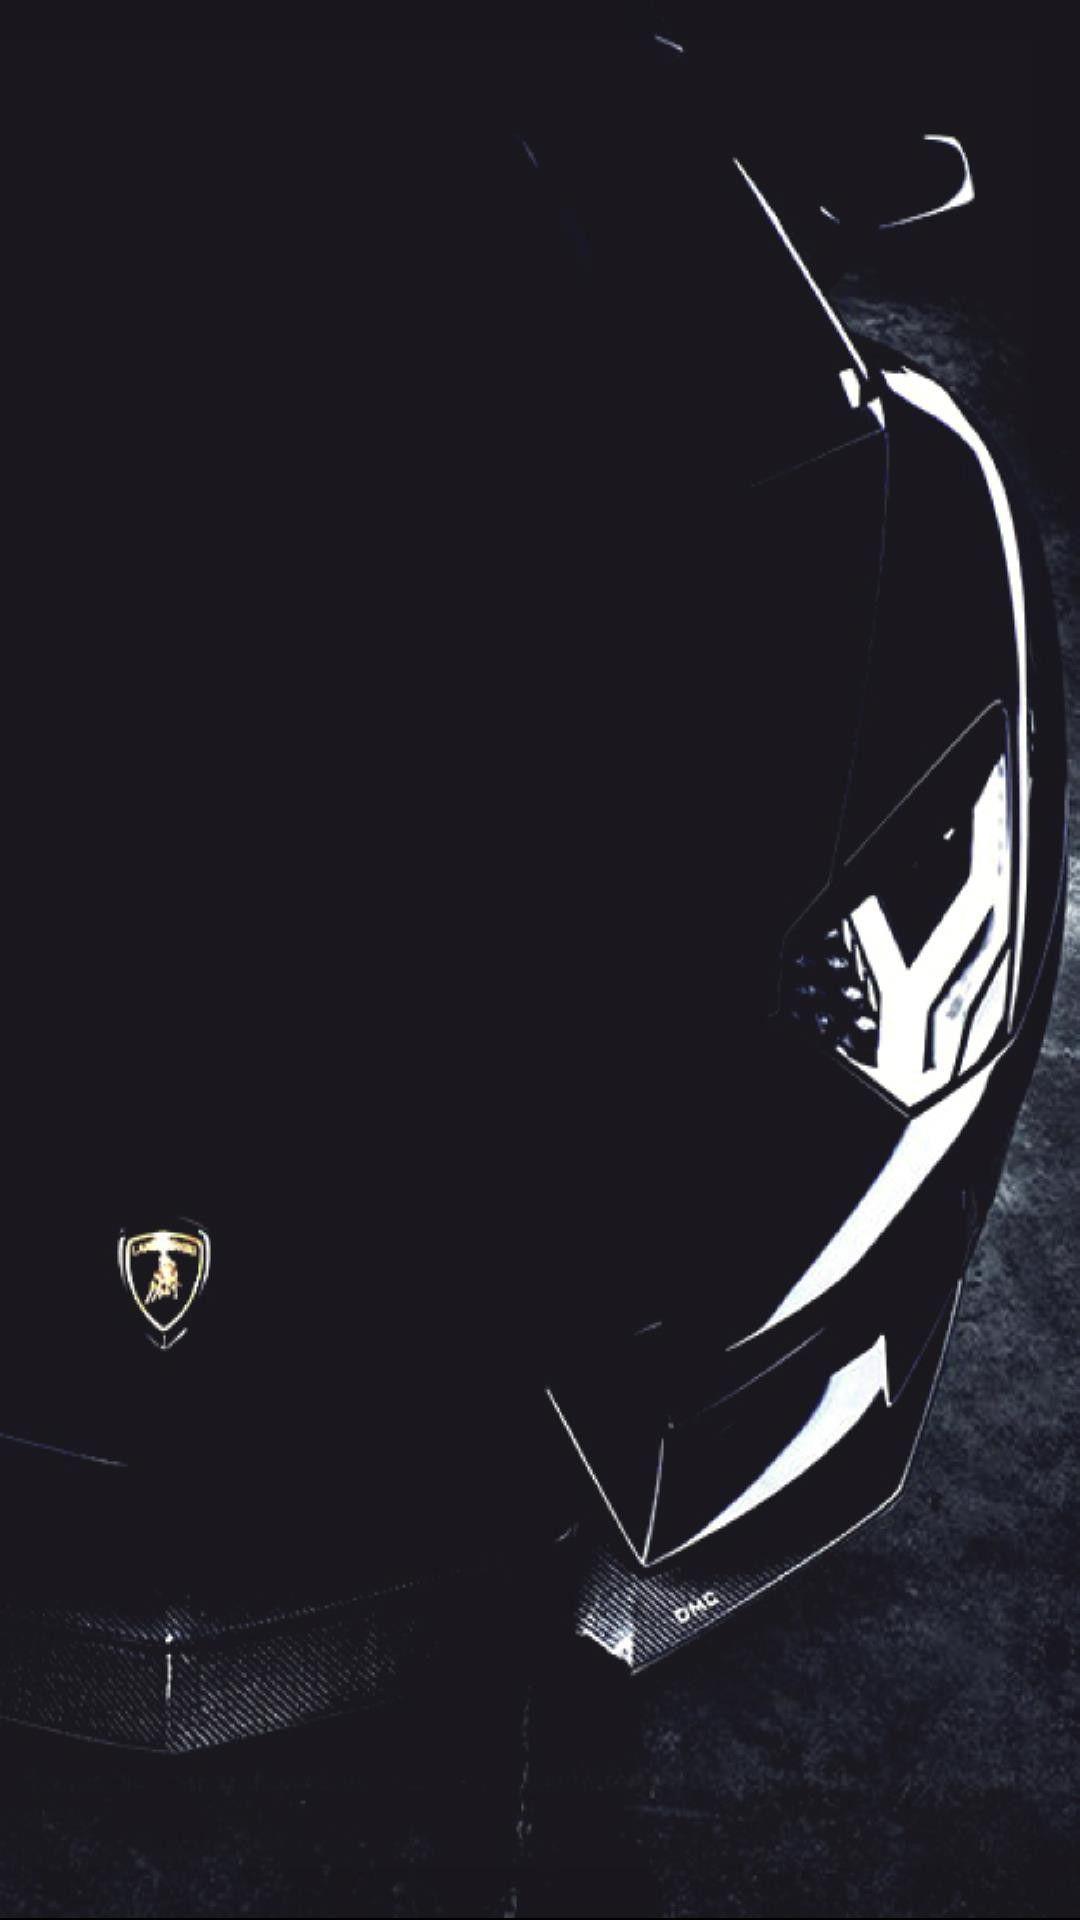 1080x1920 A Lamborghini In Black Mobile Hd Wallpaper High Quality For Phones Wallpaper Modern Hd Wallpapers For Mobile Mobile Wallpaper